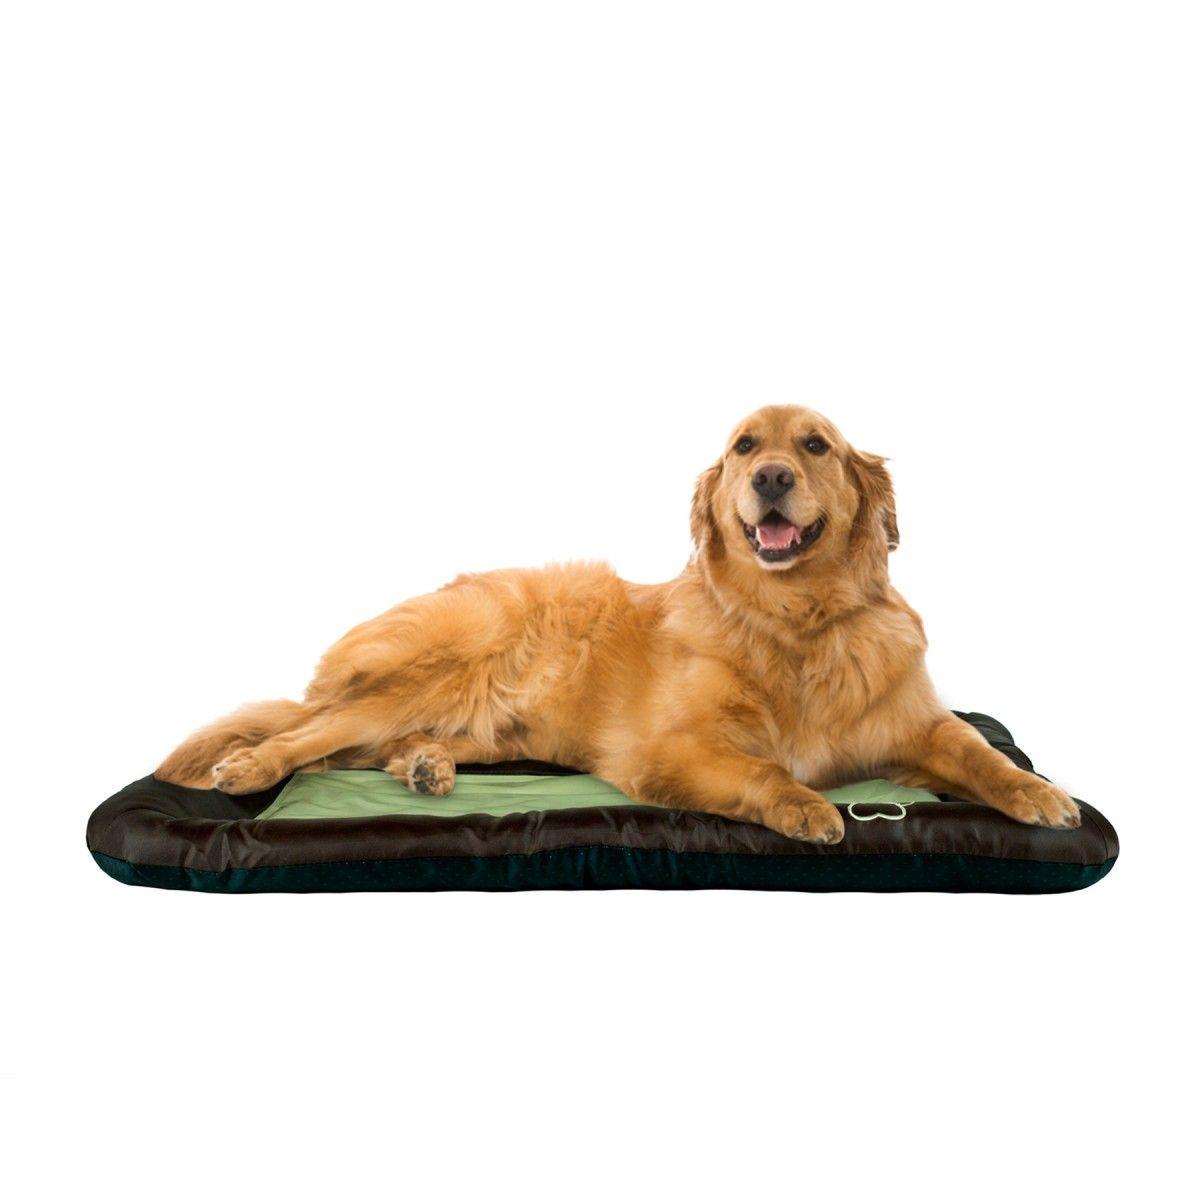 Beatrice Pet Cooling Crate Pad Dog Bed Mat 42 X 28 Brown And Taupe Pet Supplies Home Kitchen Greydock Com Dog Pet Beds Pets Pet Dogs